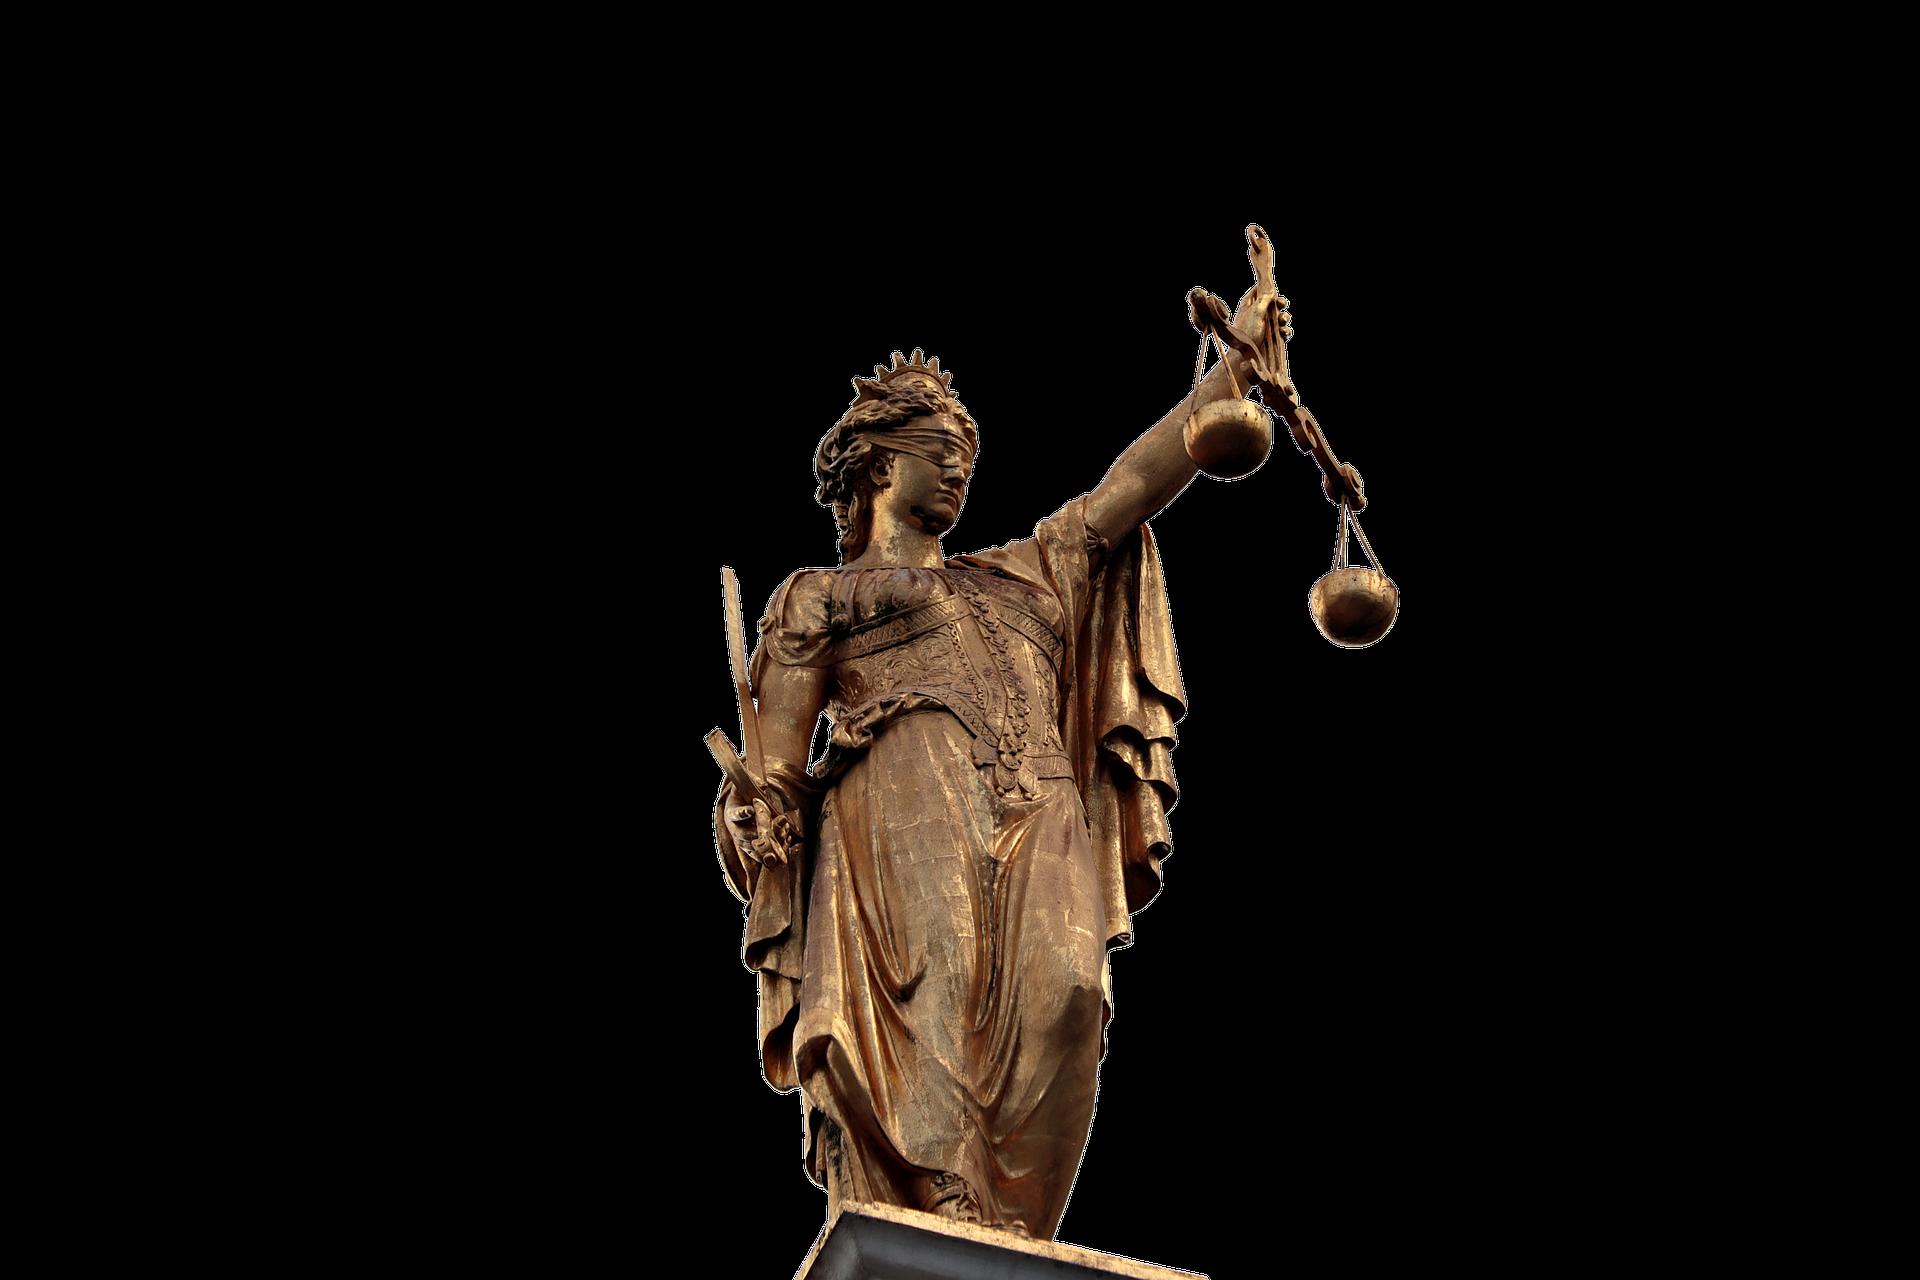 justitia-2638601_1920.png